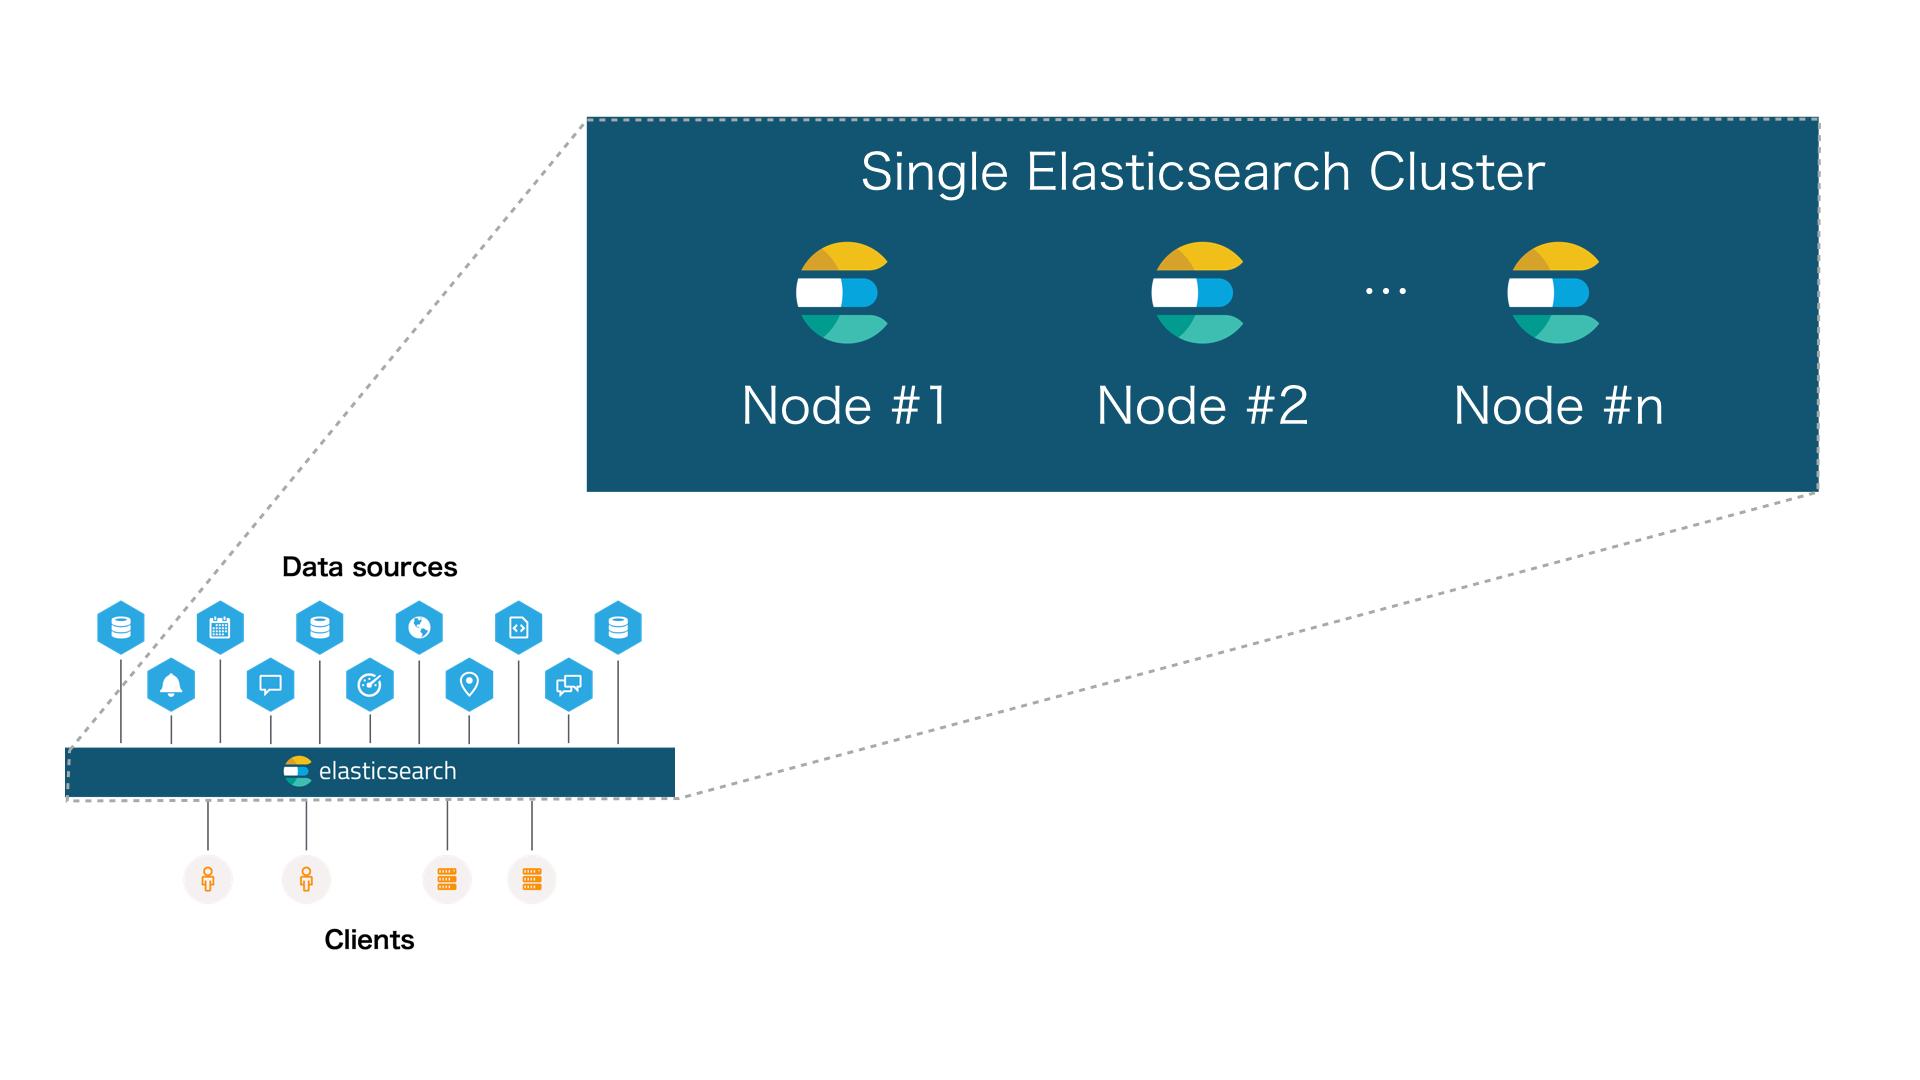 single elasticsearch cluster